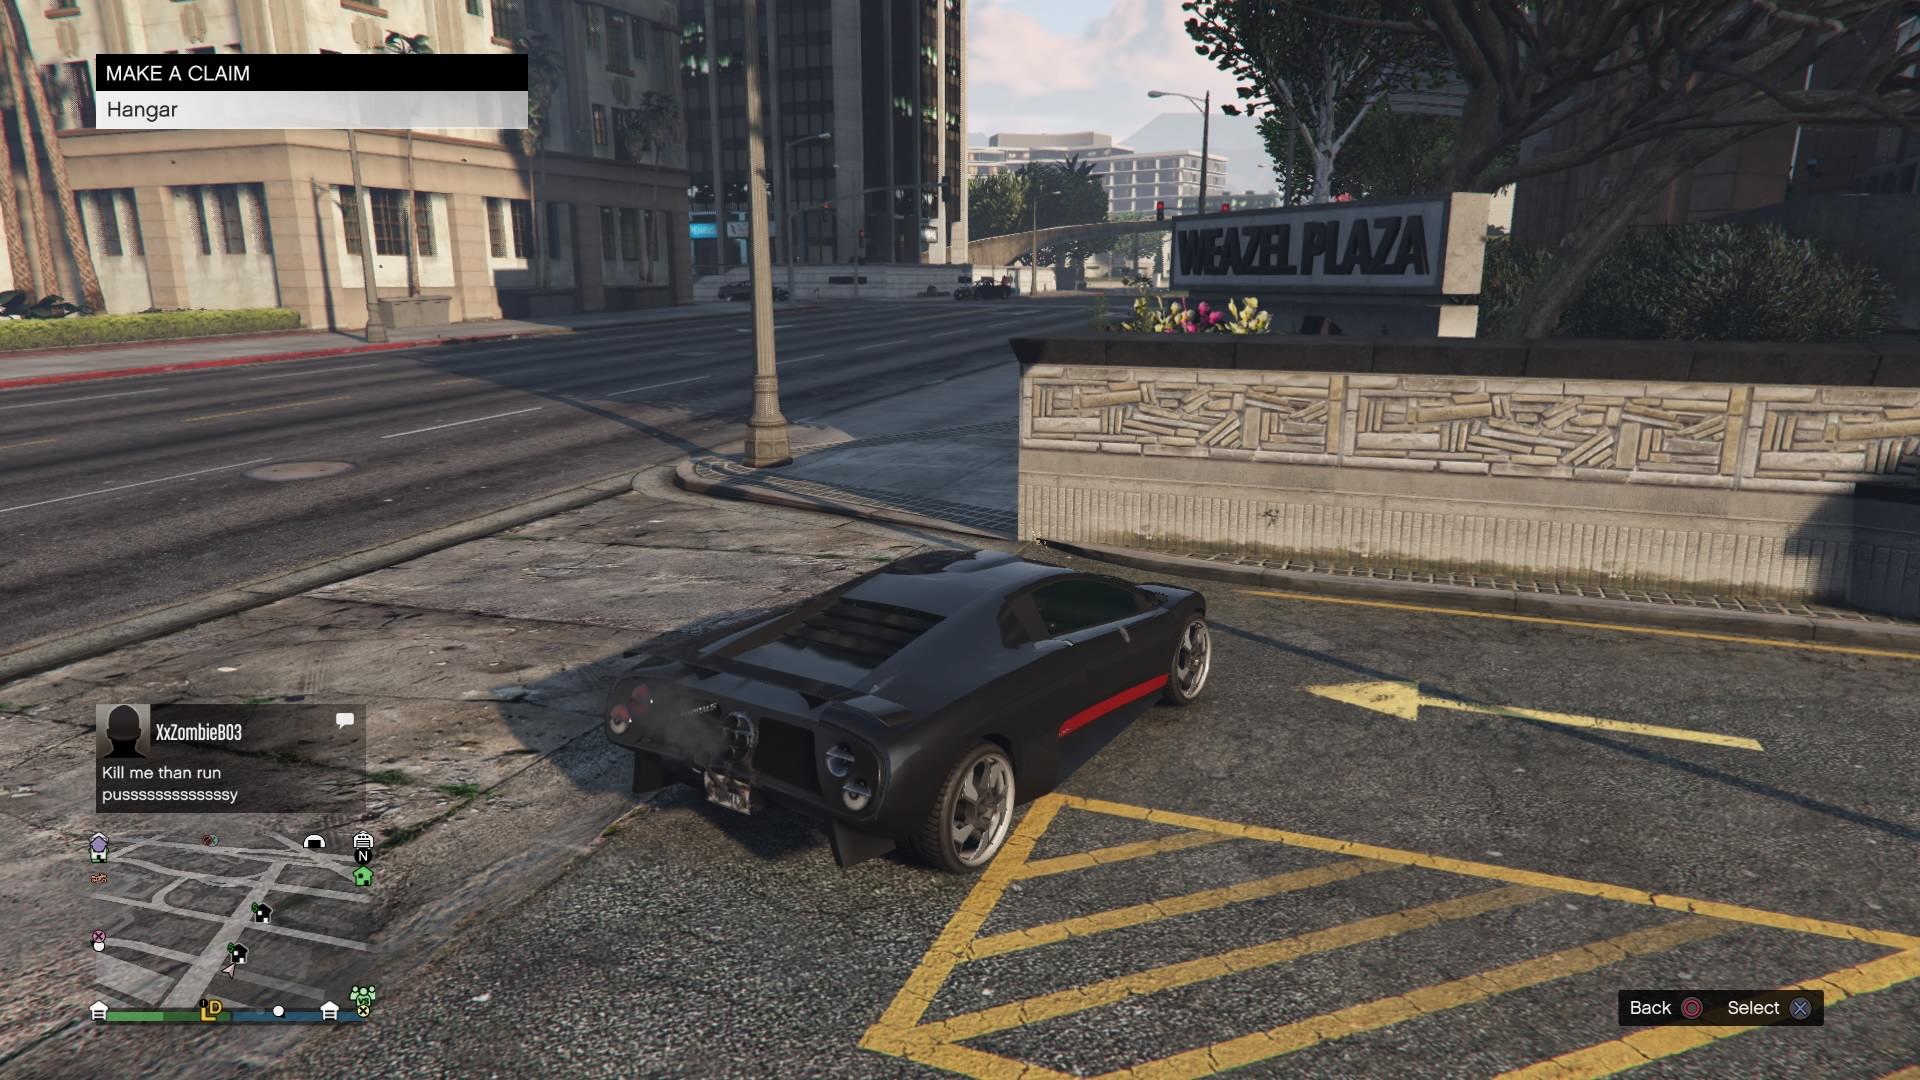 Grand_Theft_Auto_V_20171003010115.jpg